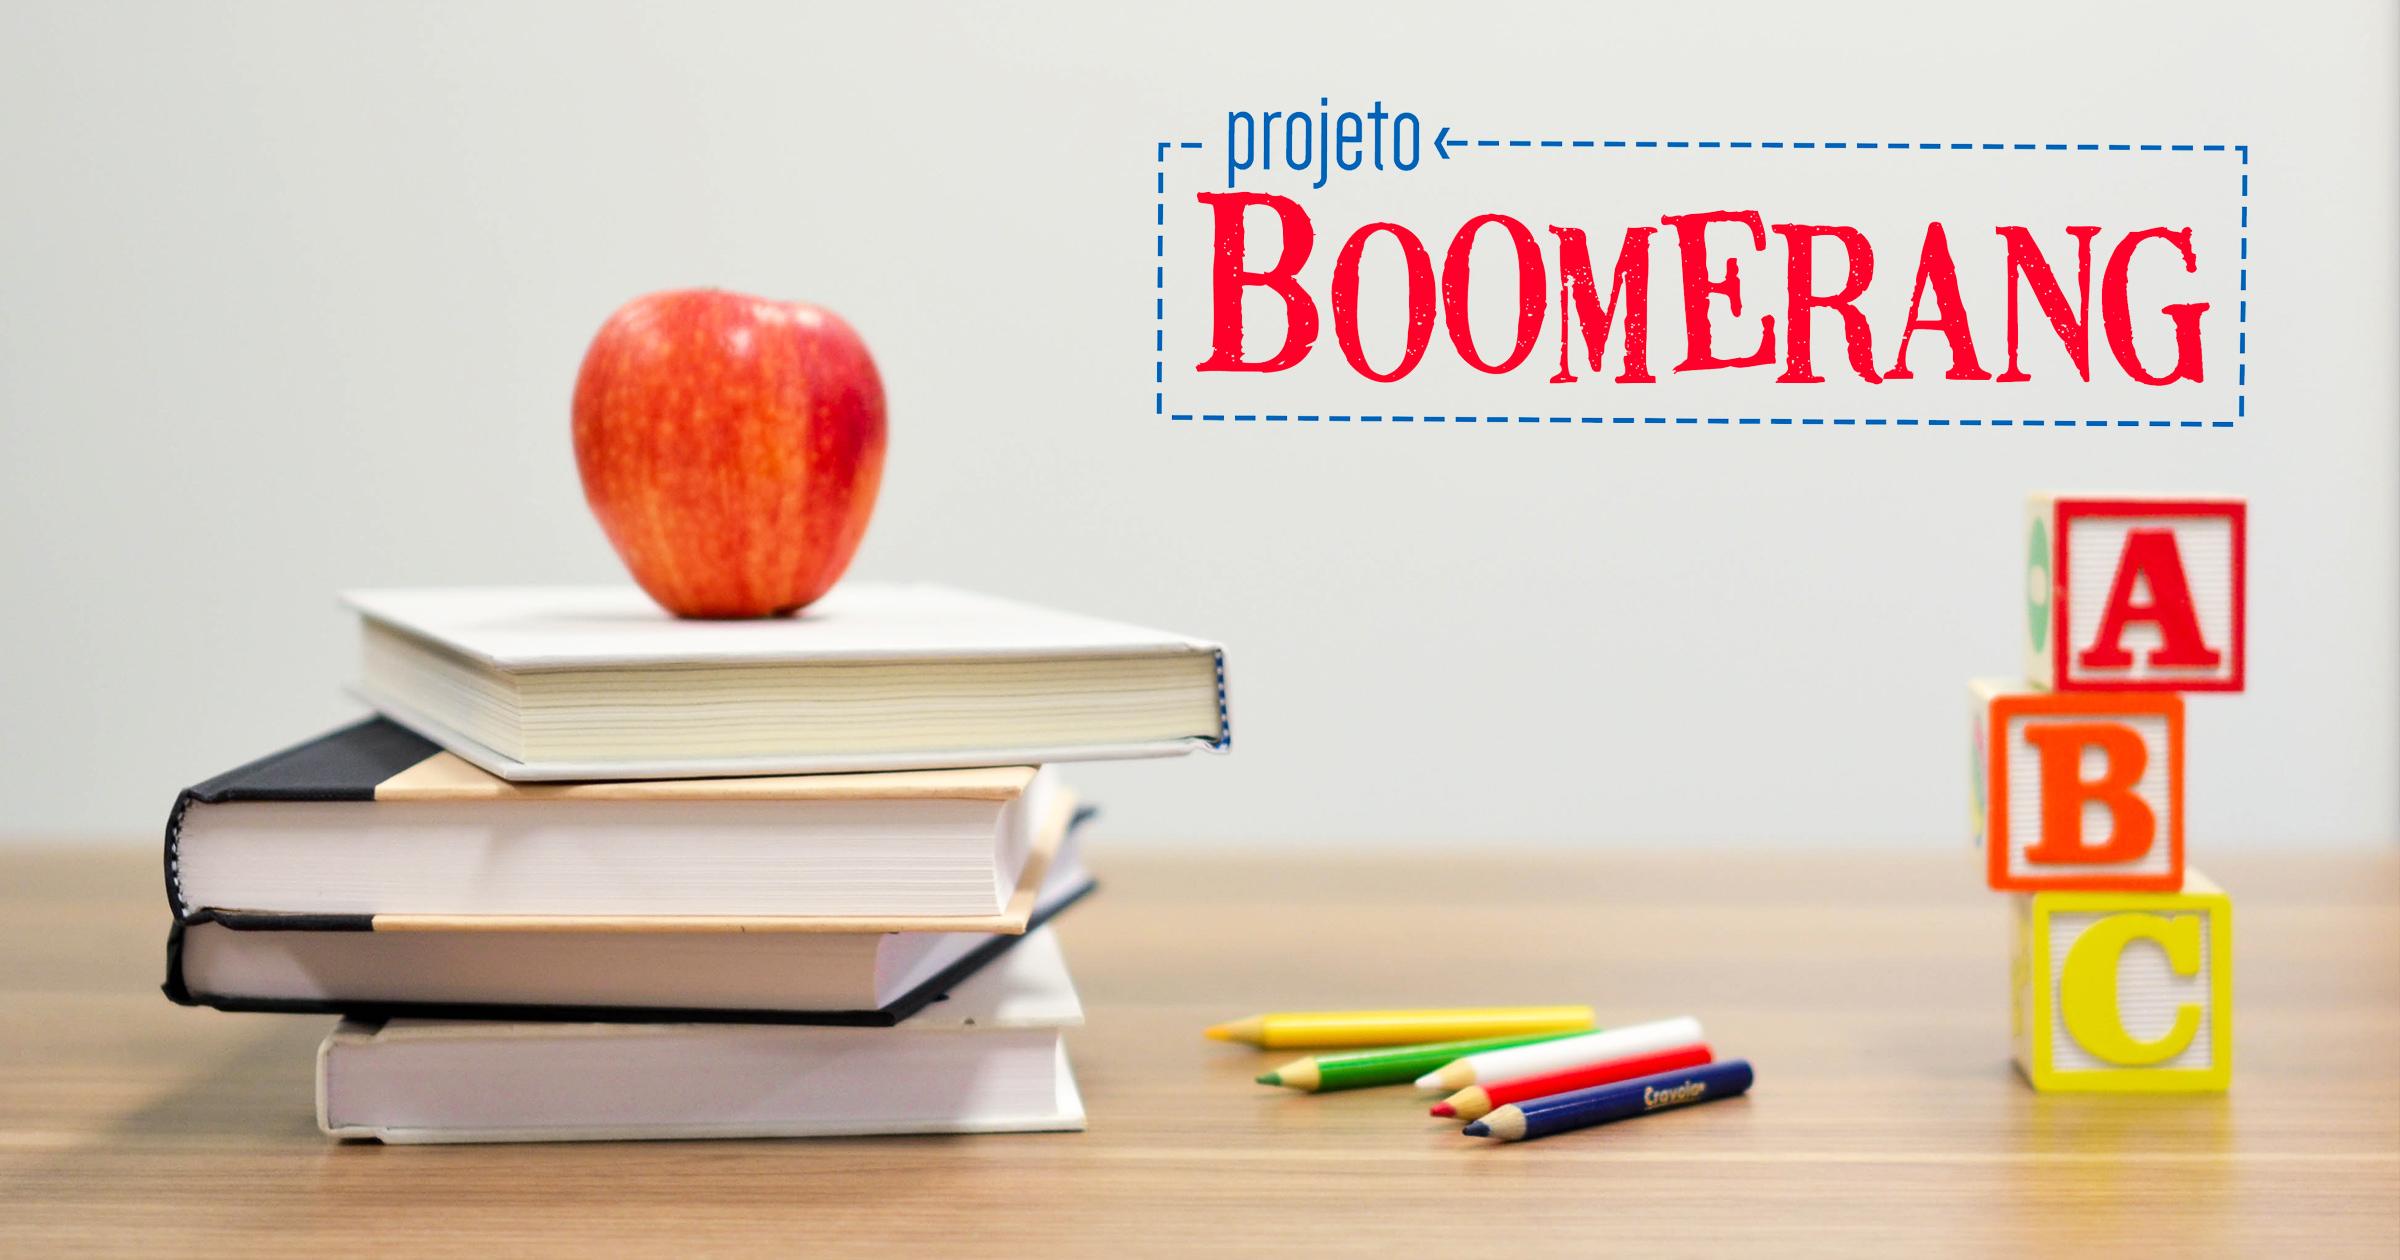 Banner-Boomerang.jpg